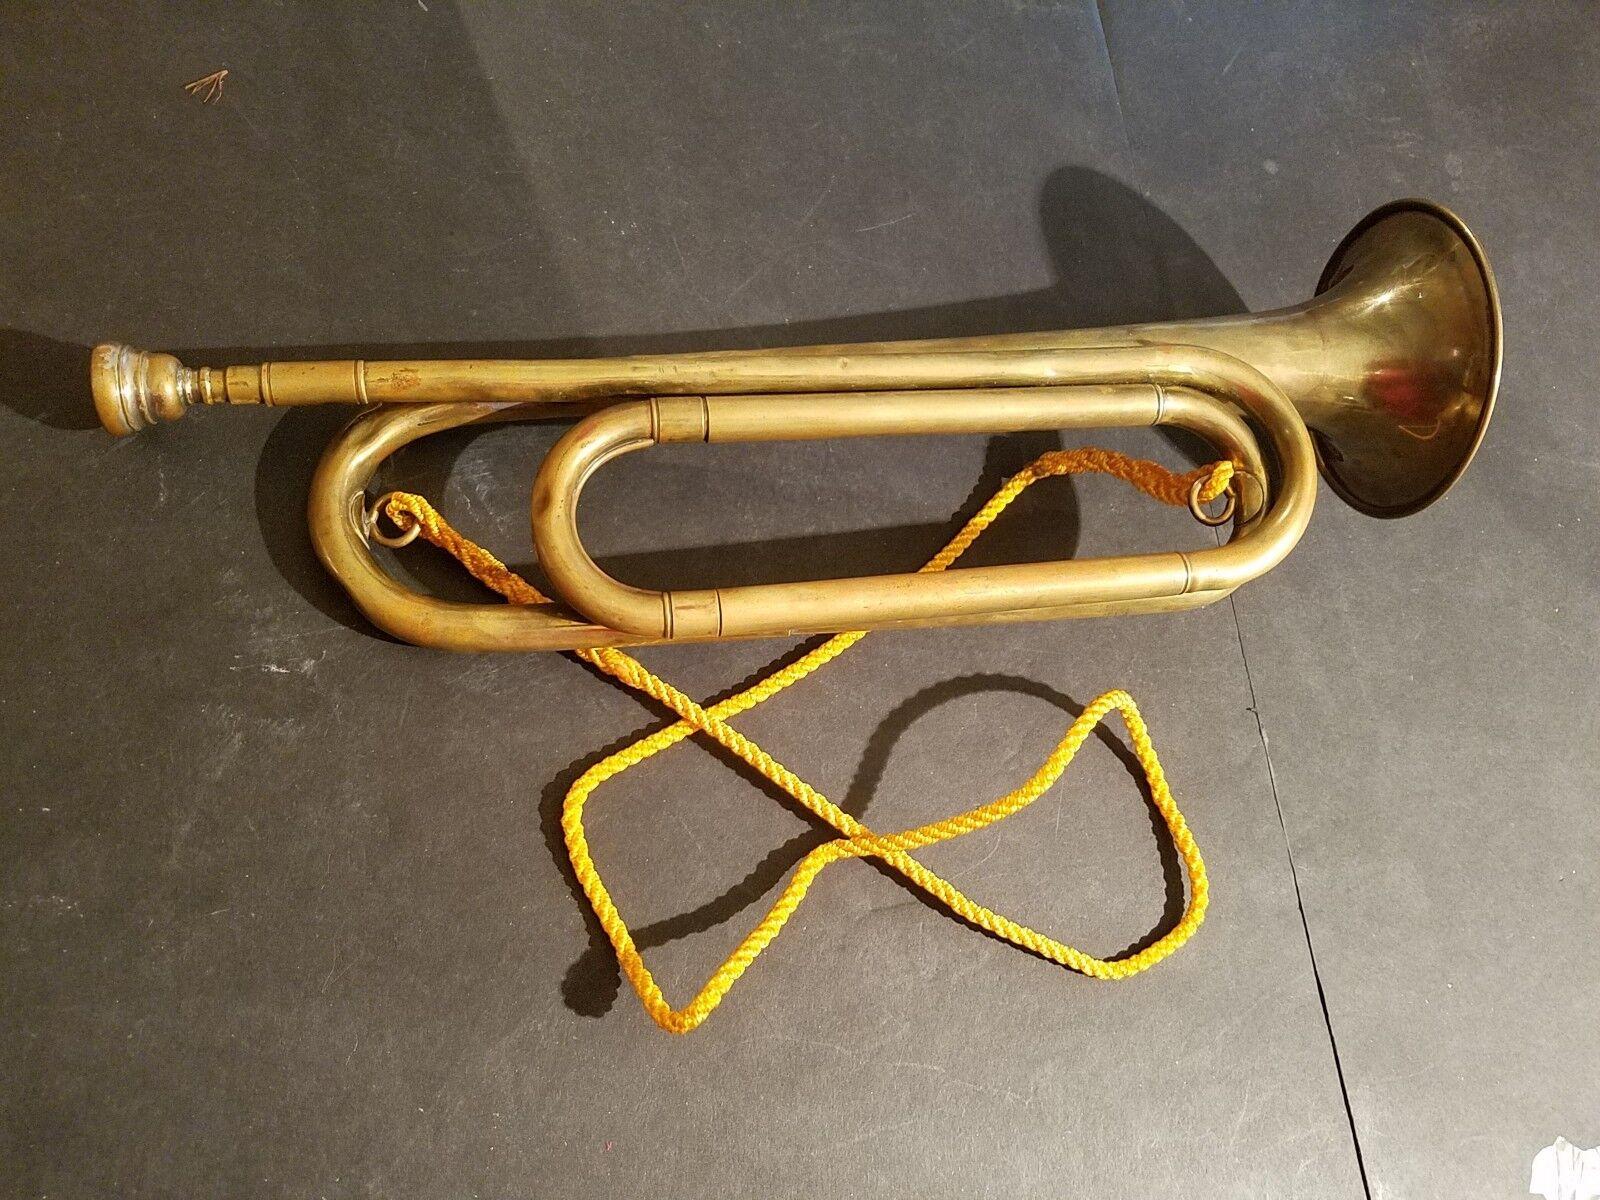 Antique Brass Bugle Rexcraft US Regulation Vintage Military W Mouthpiece 1930's